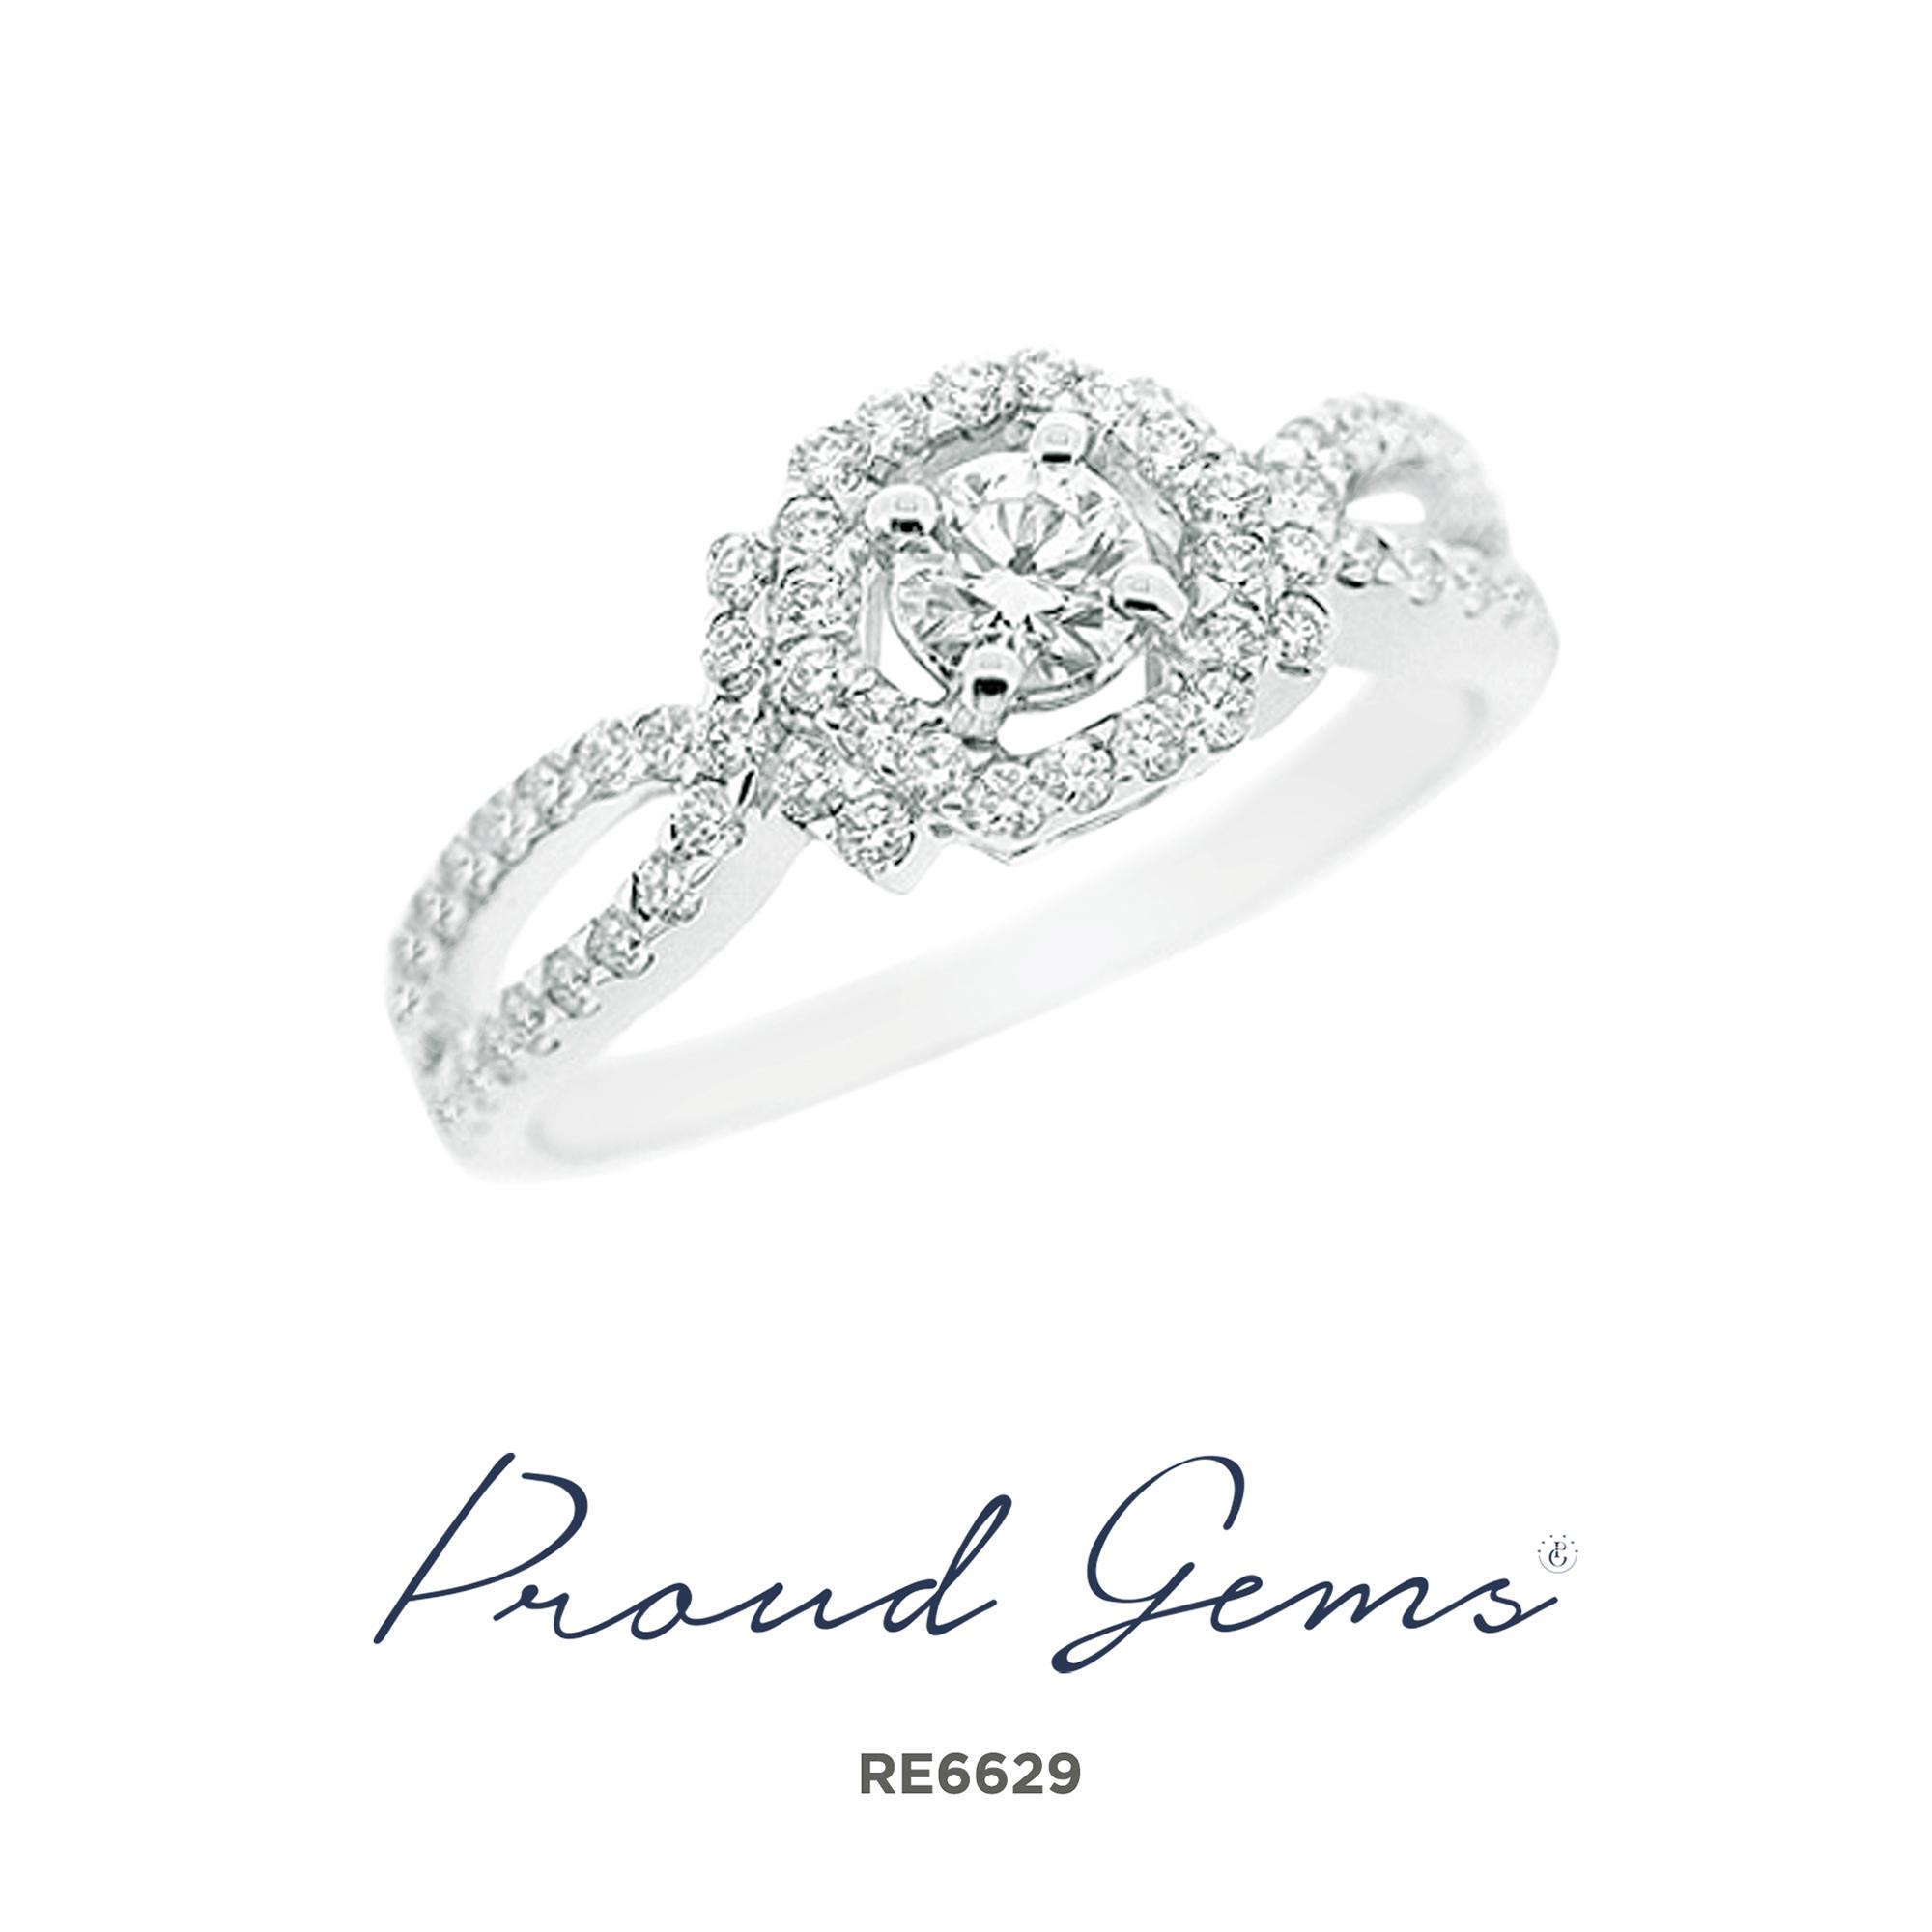 6629RE1 1 - แหวนหมั้นเพชร RE5282